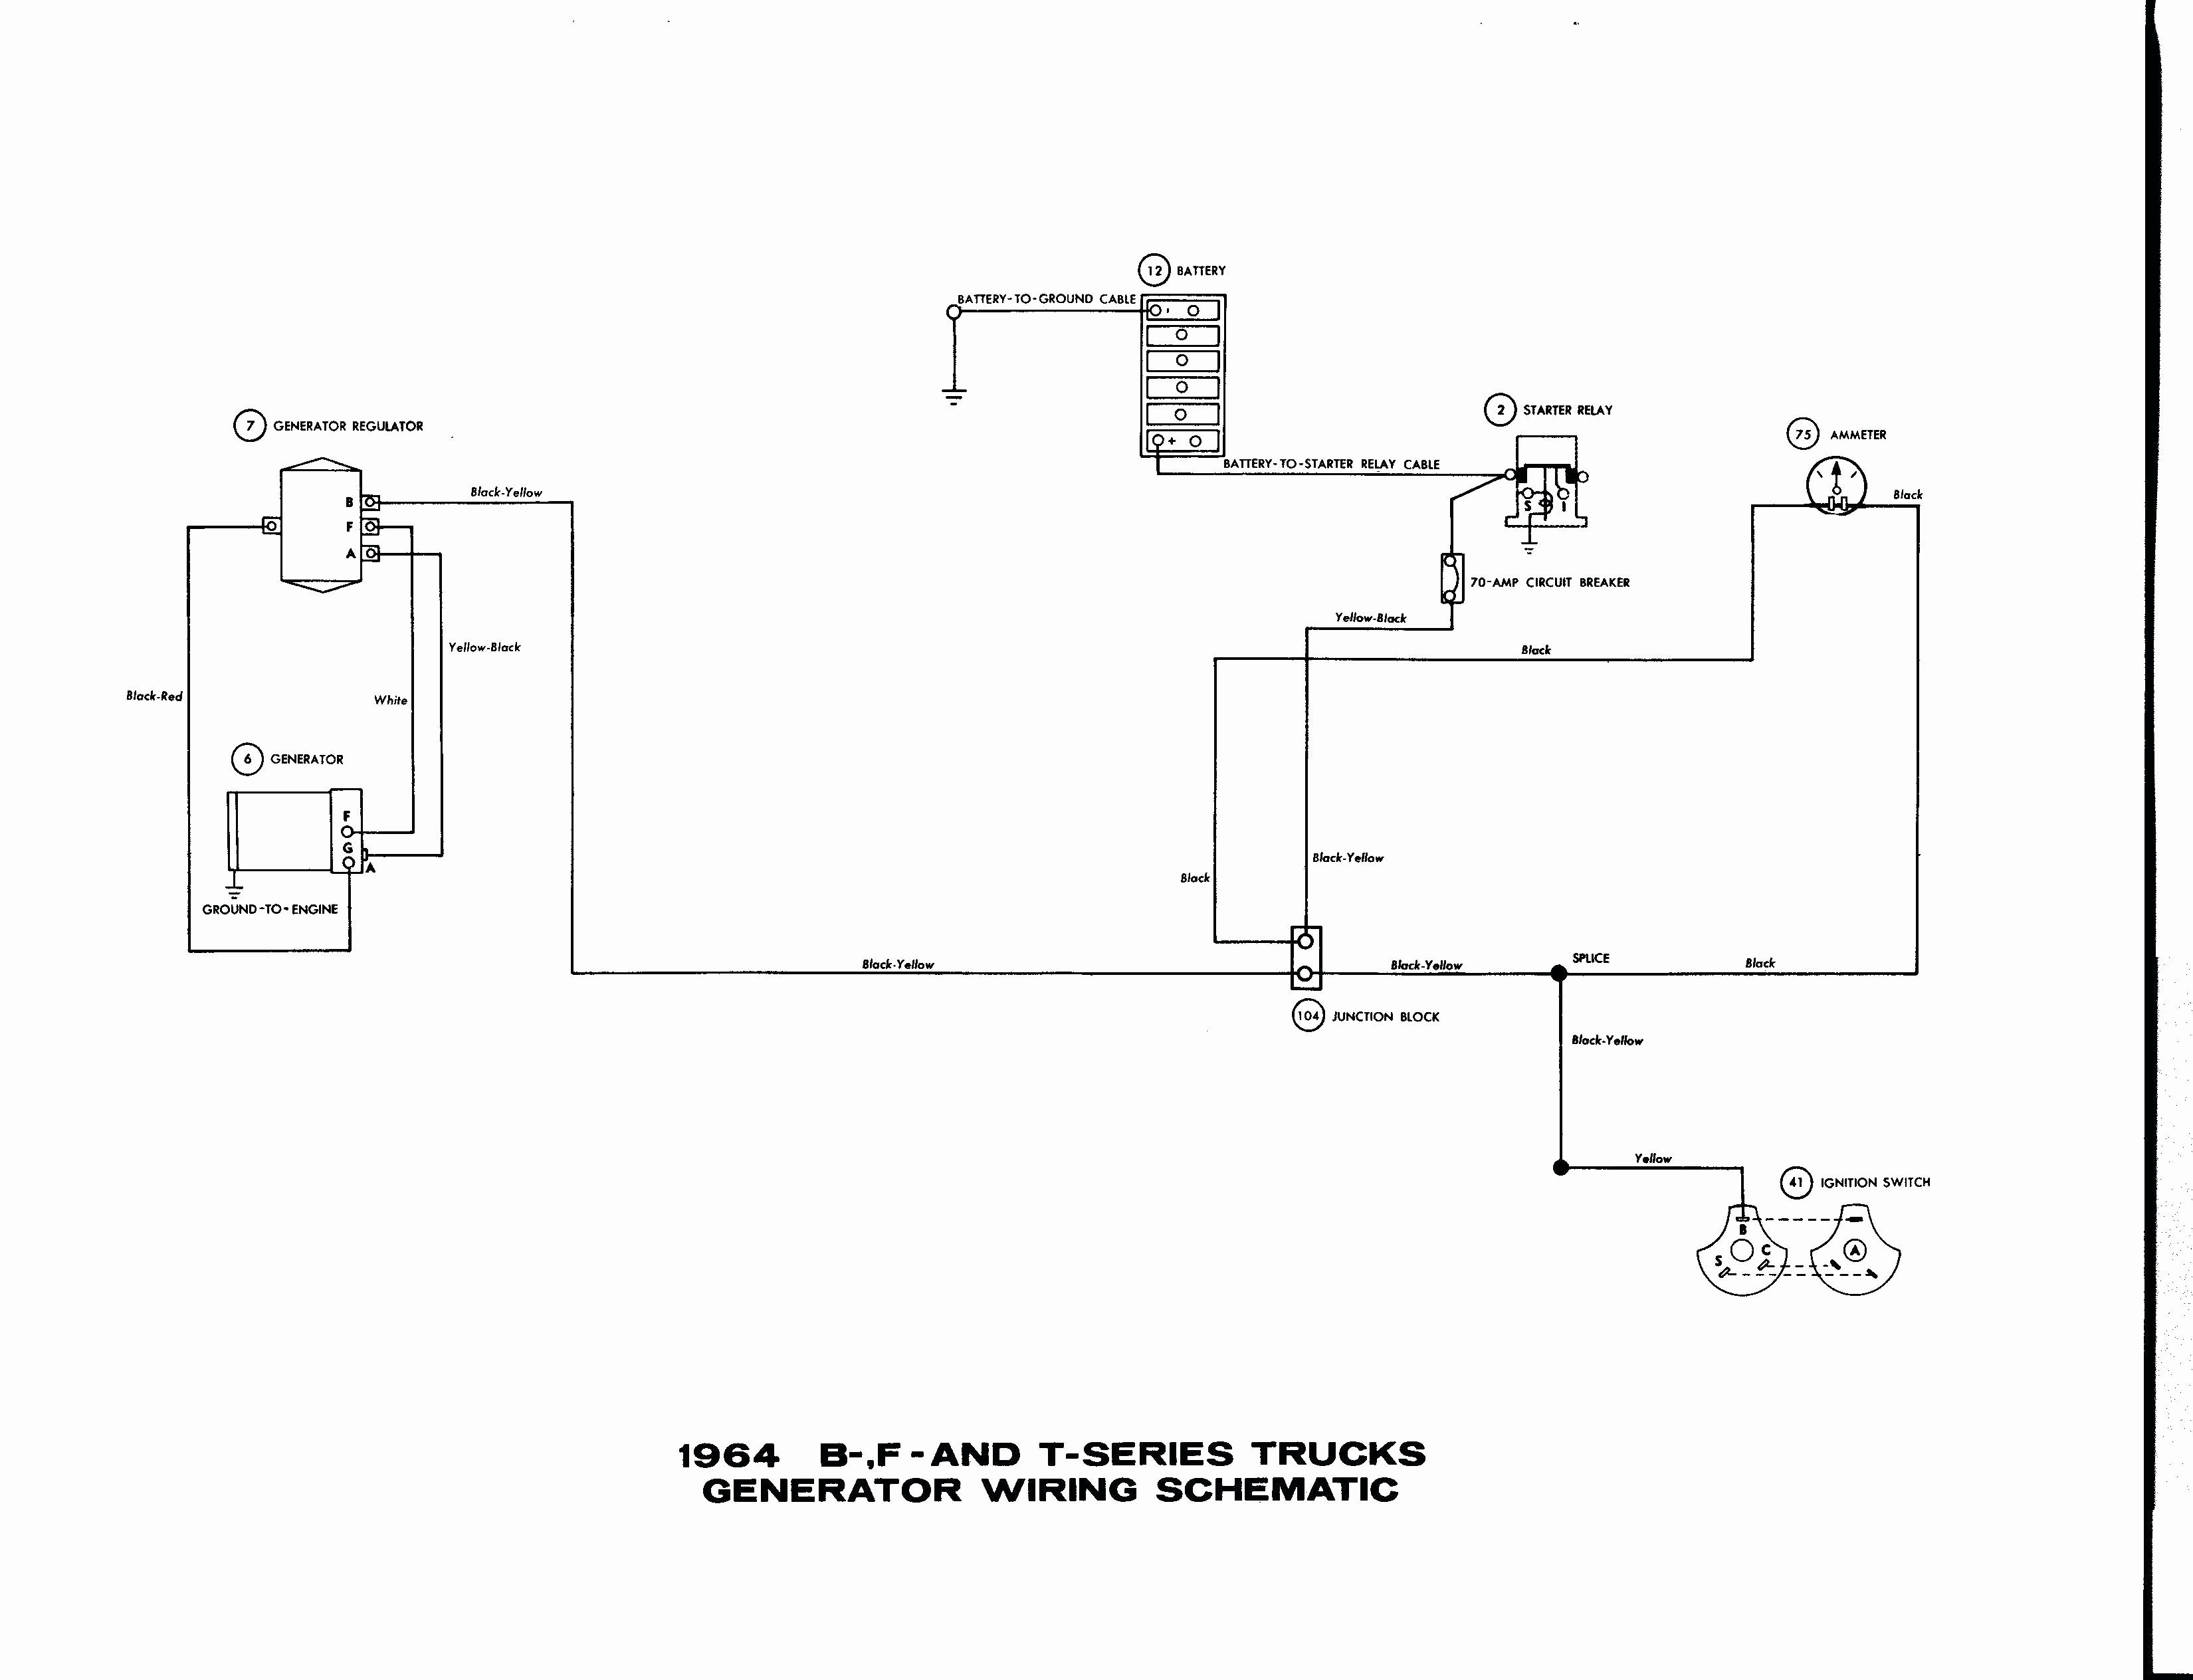 Powermaster One Wire Alternator Diagram | Manual E-Books - Powermaster Alternator Wiring Diagram